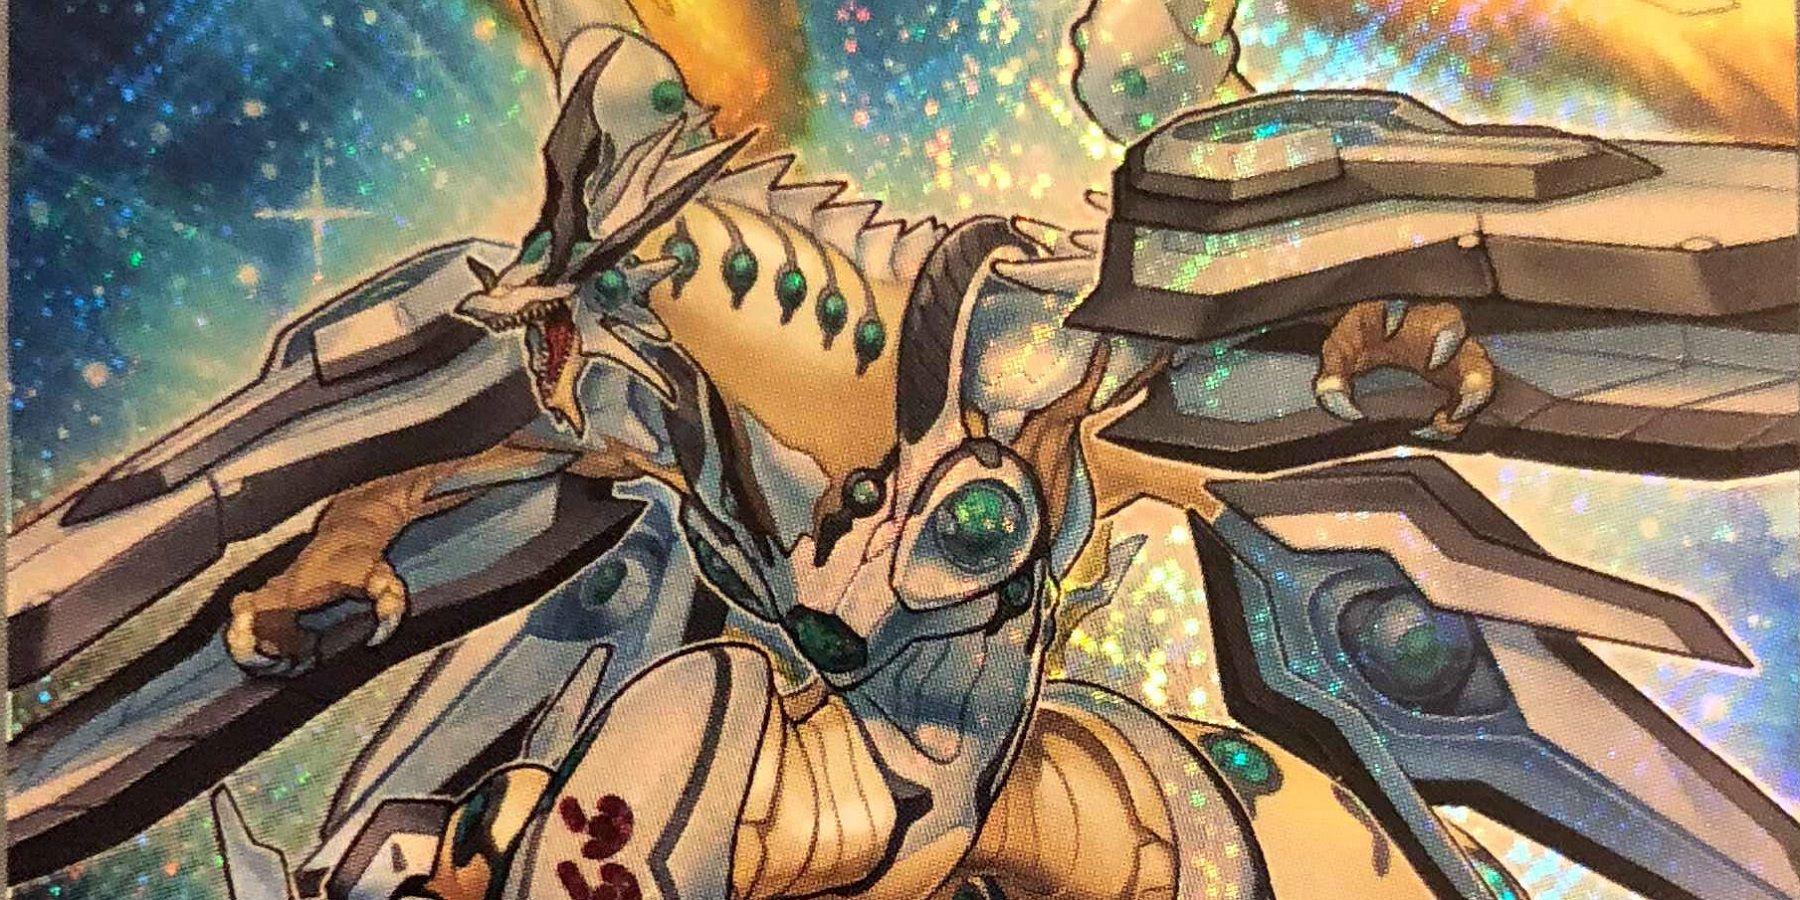 Yu-Gi-Oh! ZEXAL: Best Utopia Monsters | CBR